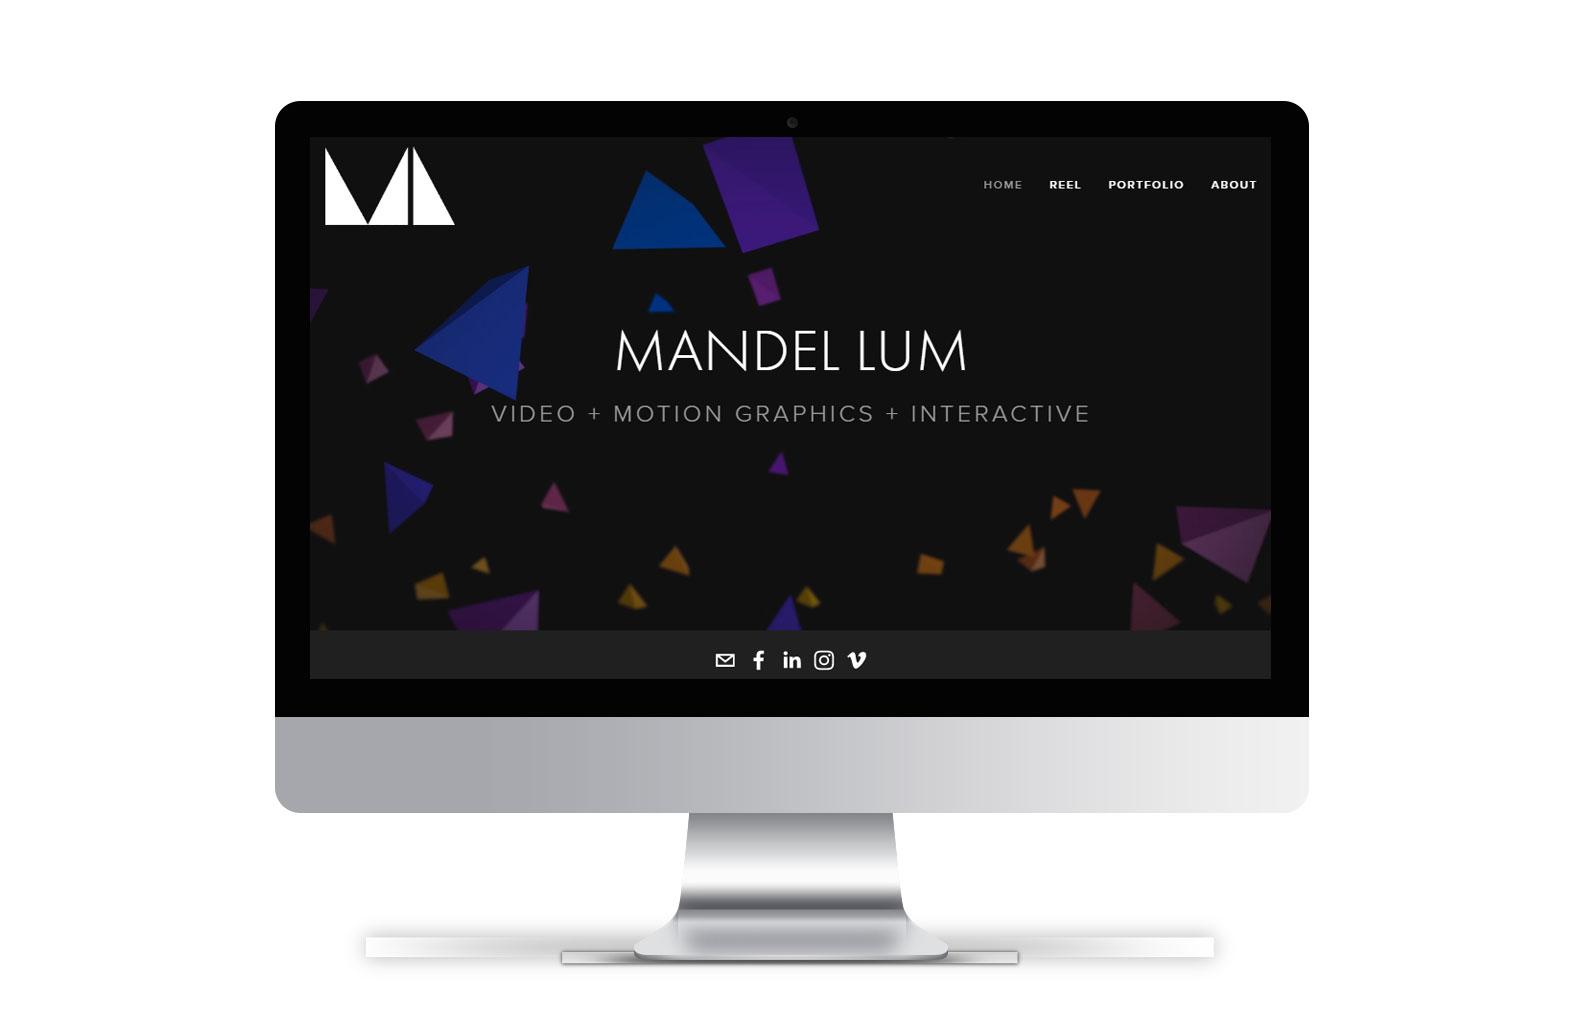 Mandellum.com